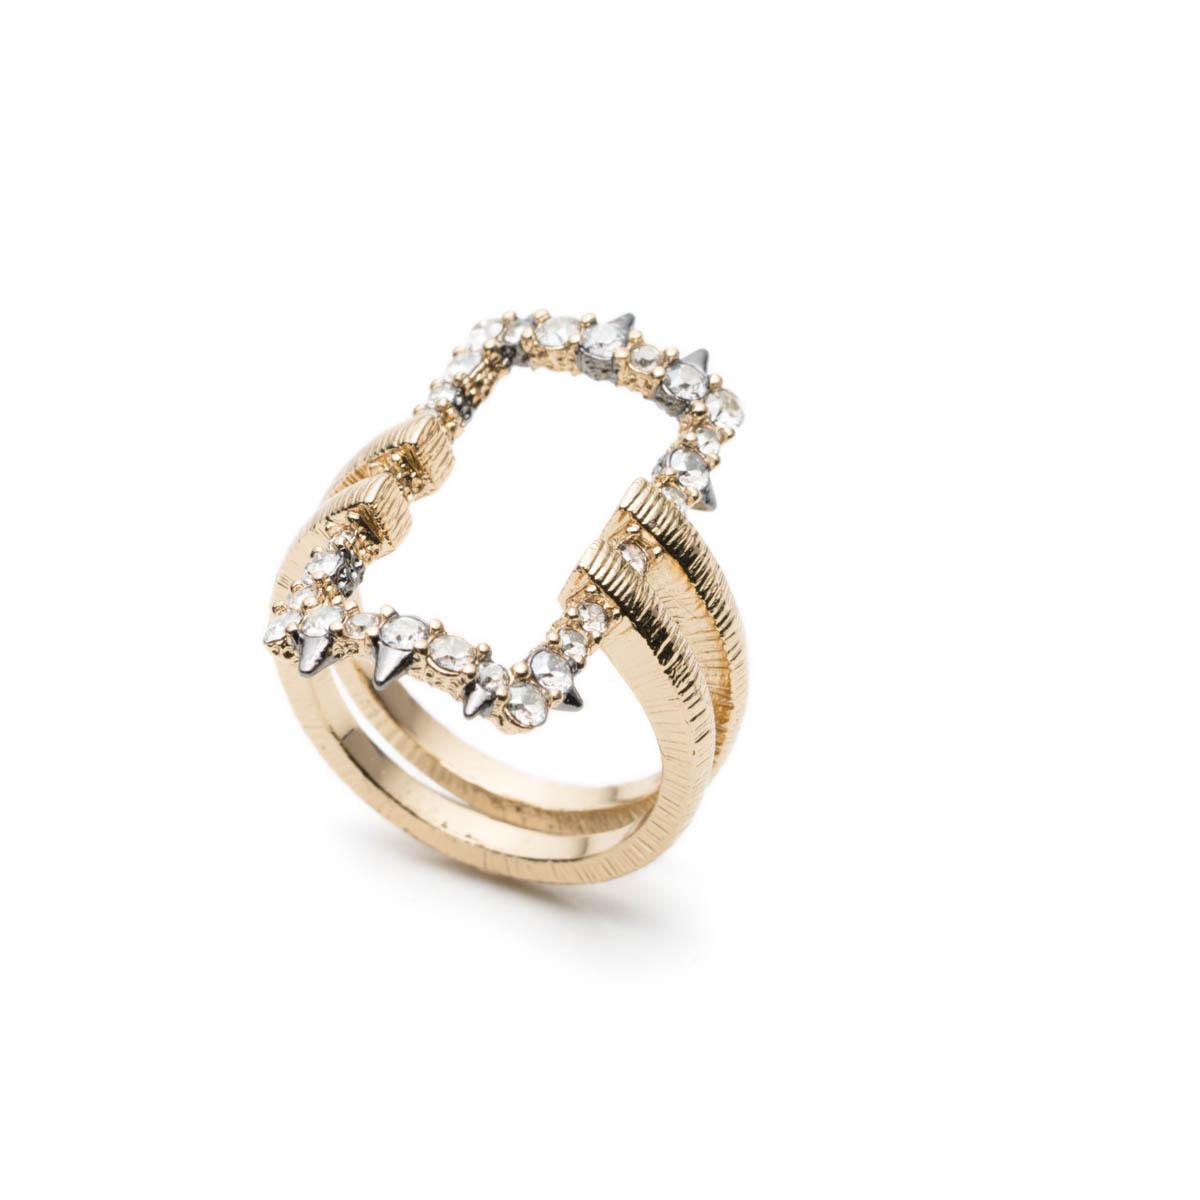 Crystal Encrusted Oversized Link Ring